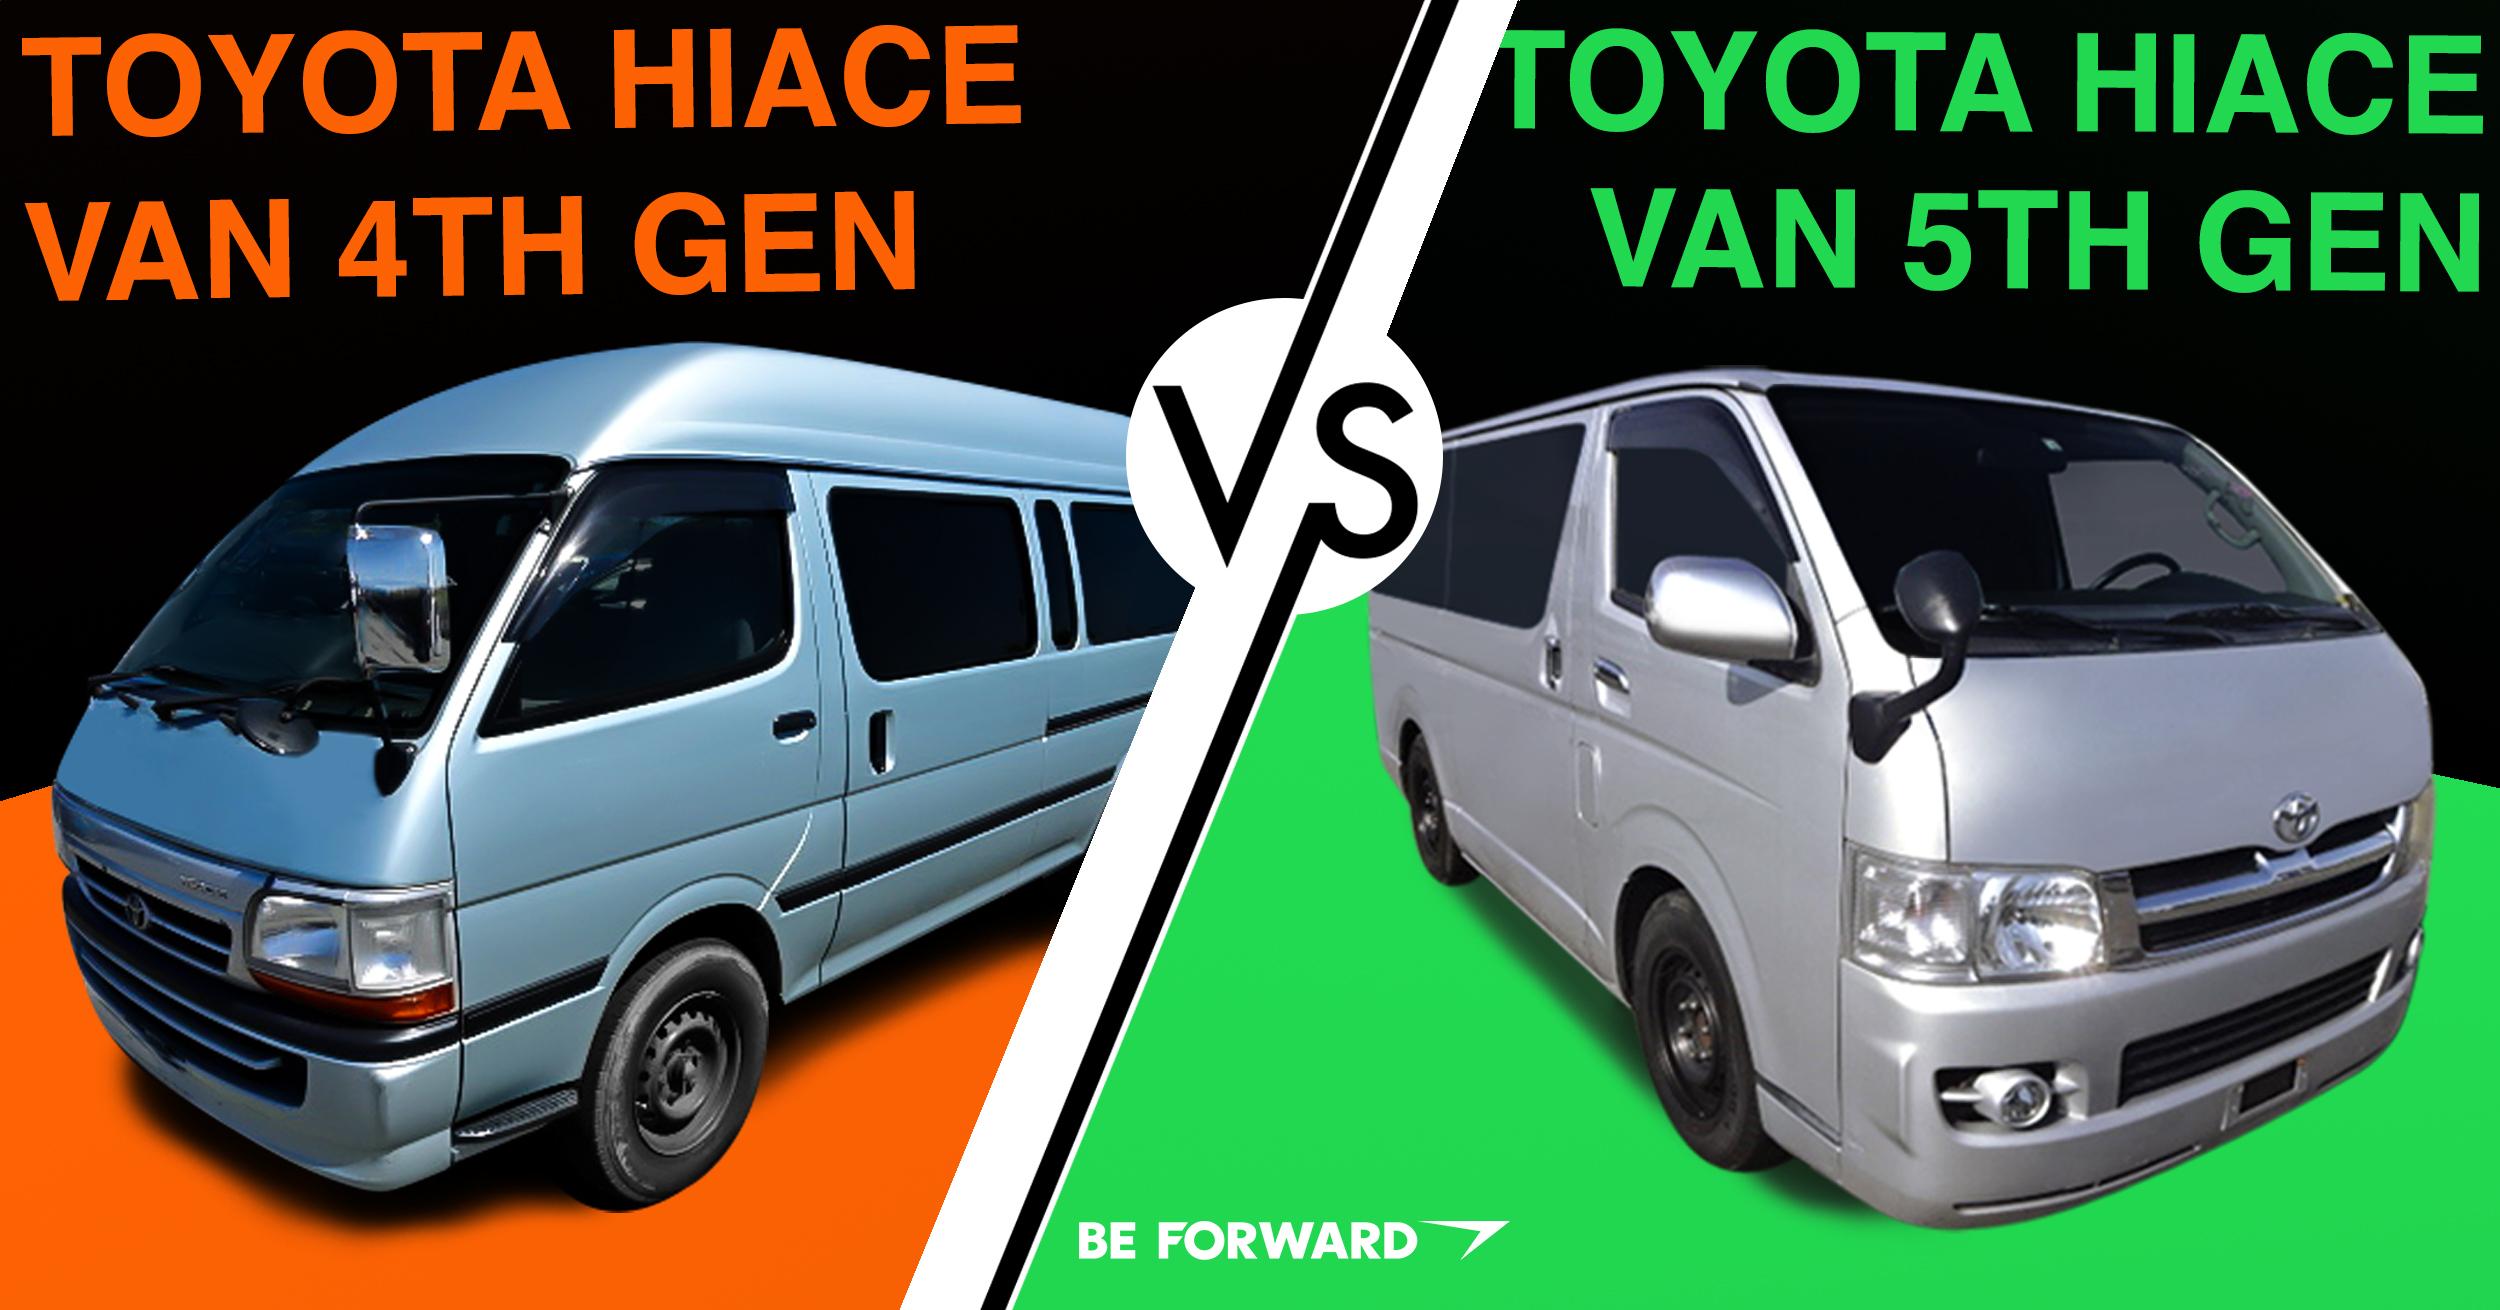 4th 5th Generation Toyota Hiace Vans A Head To Head Comparison